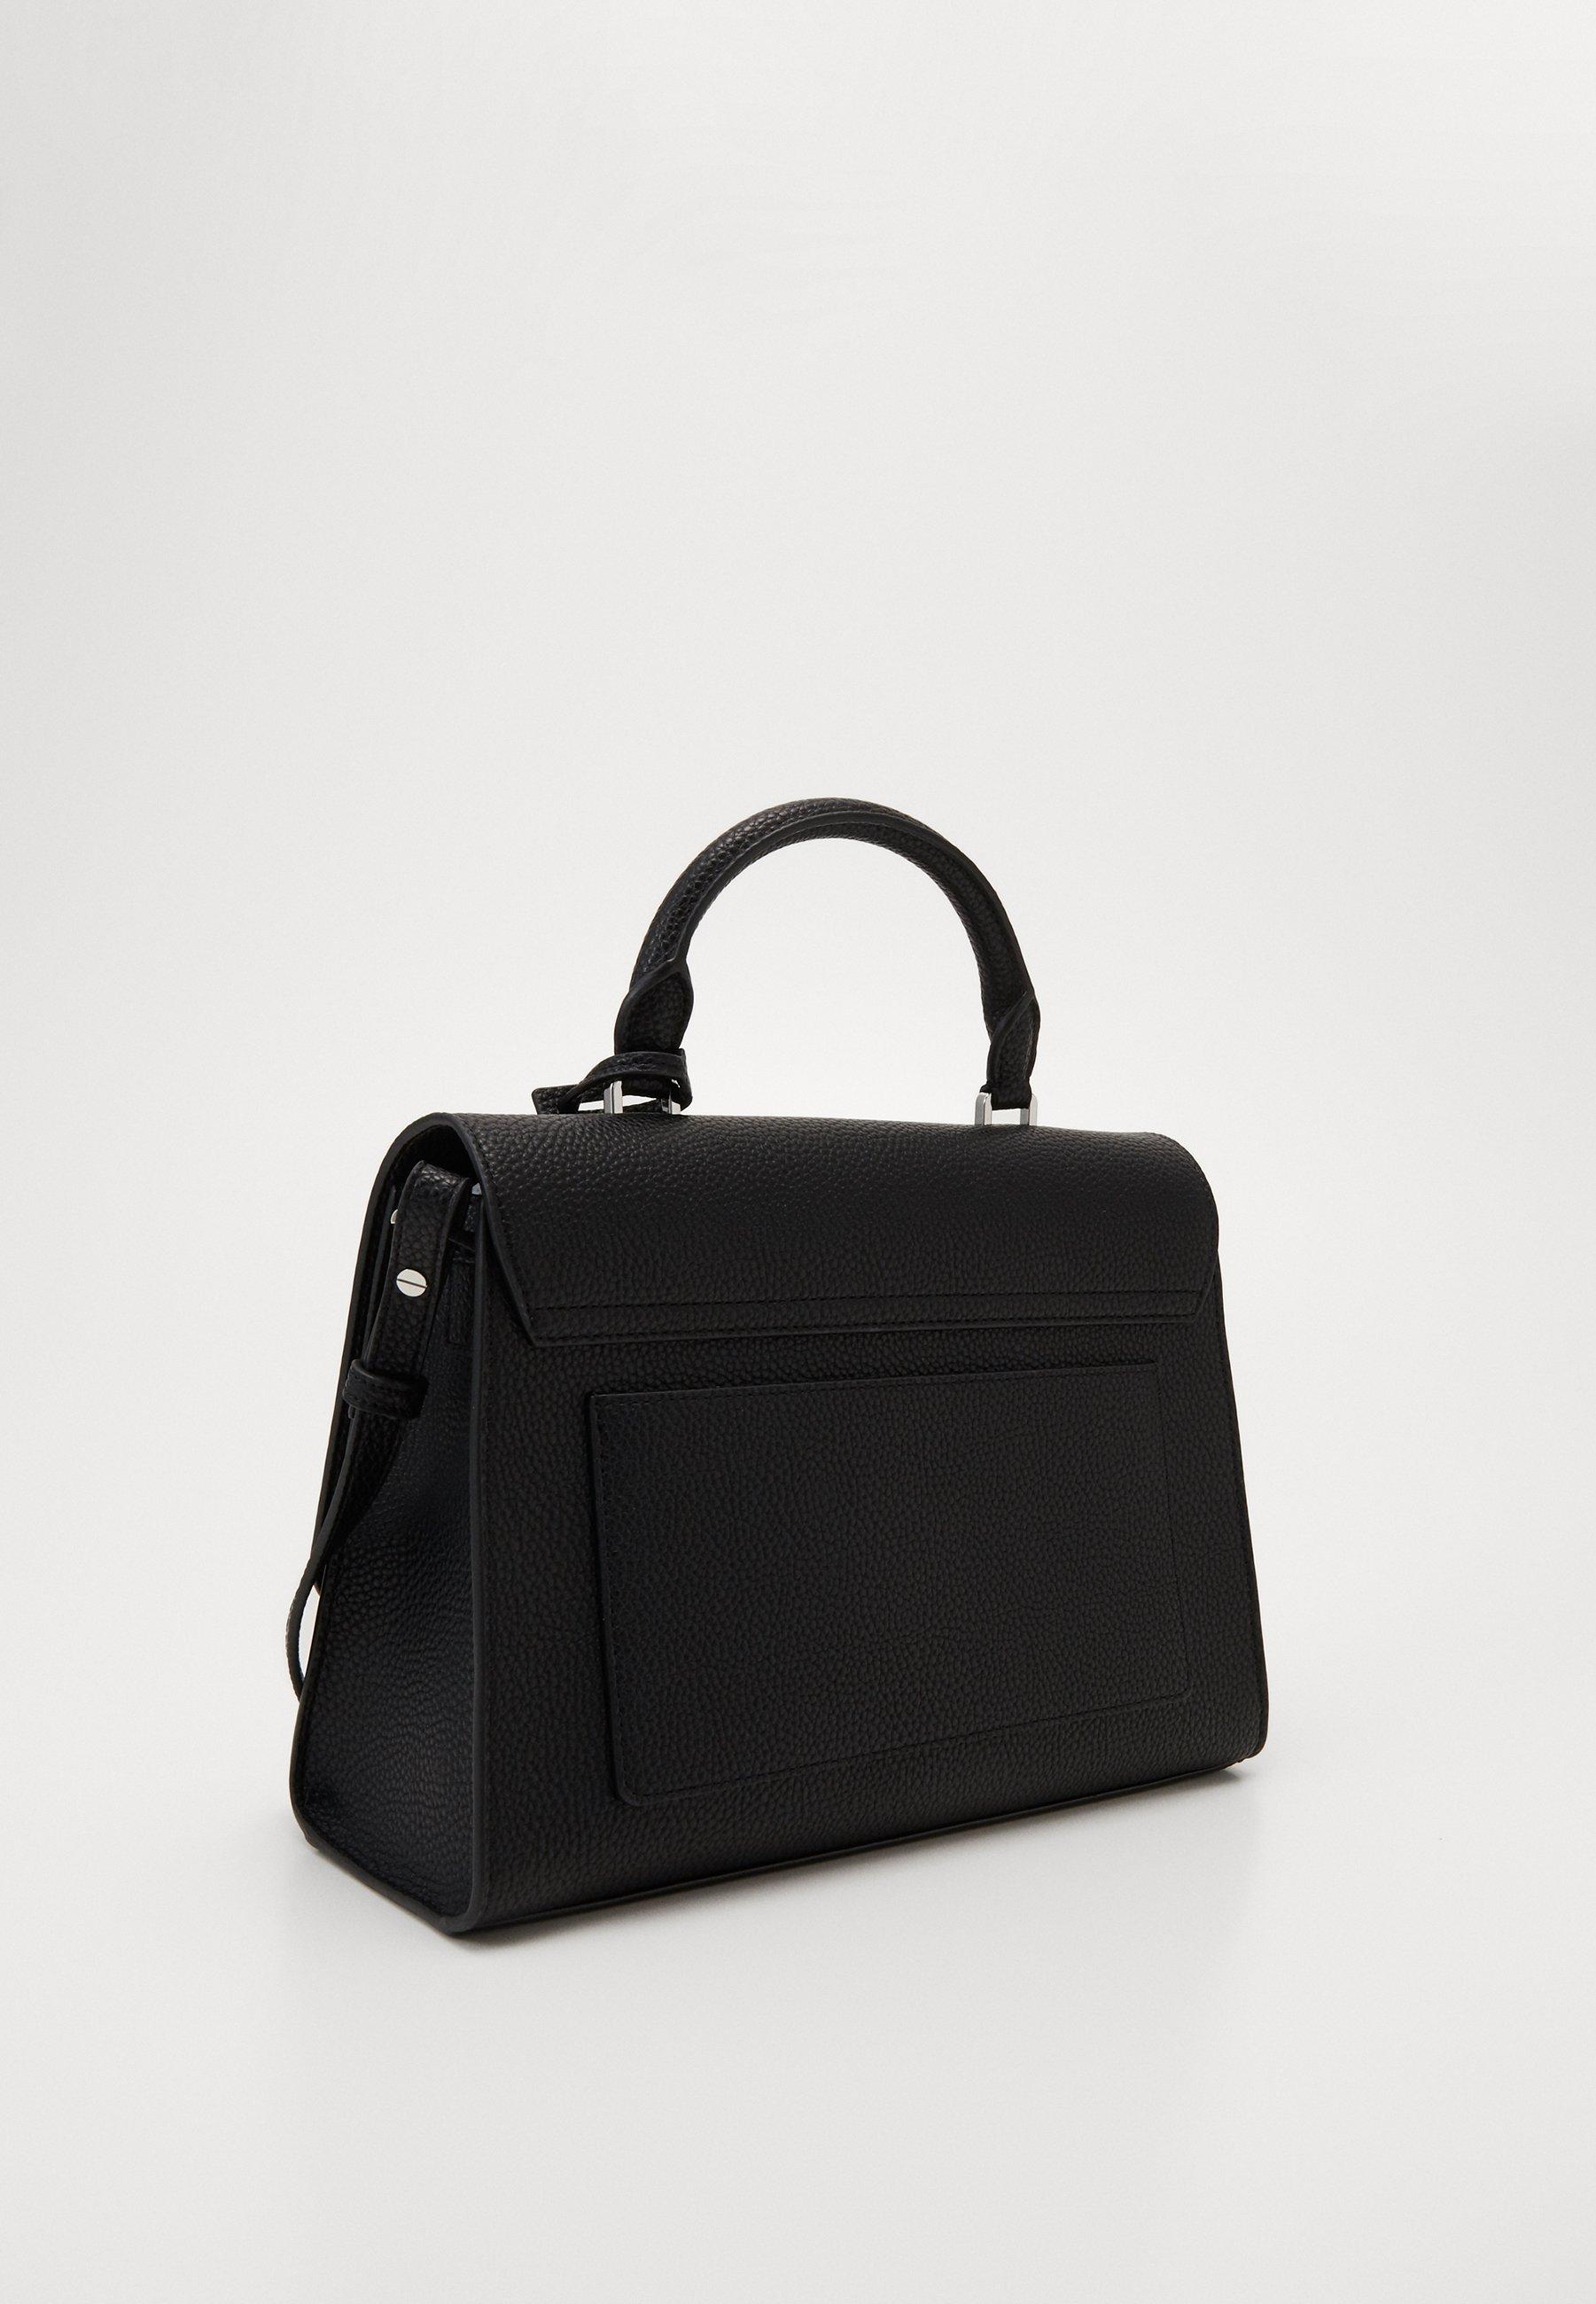 Cheapest Best Place Accessories Calvin Klein DRESSED BUSINESS TOP HANDLE Handbag black PJRXKhxOd tcGvMv93I